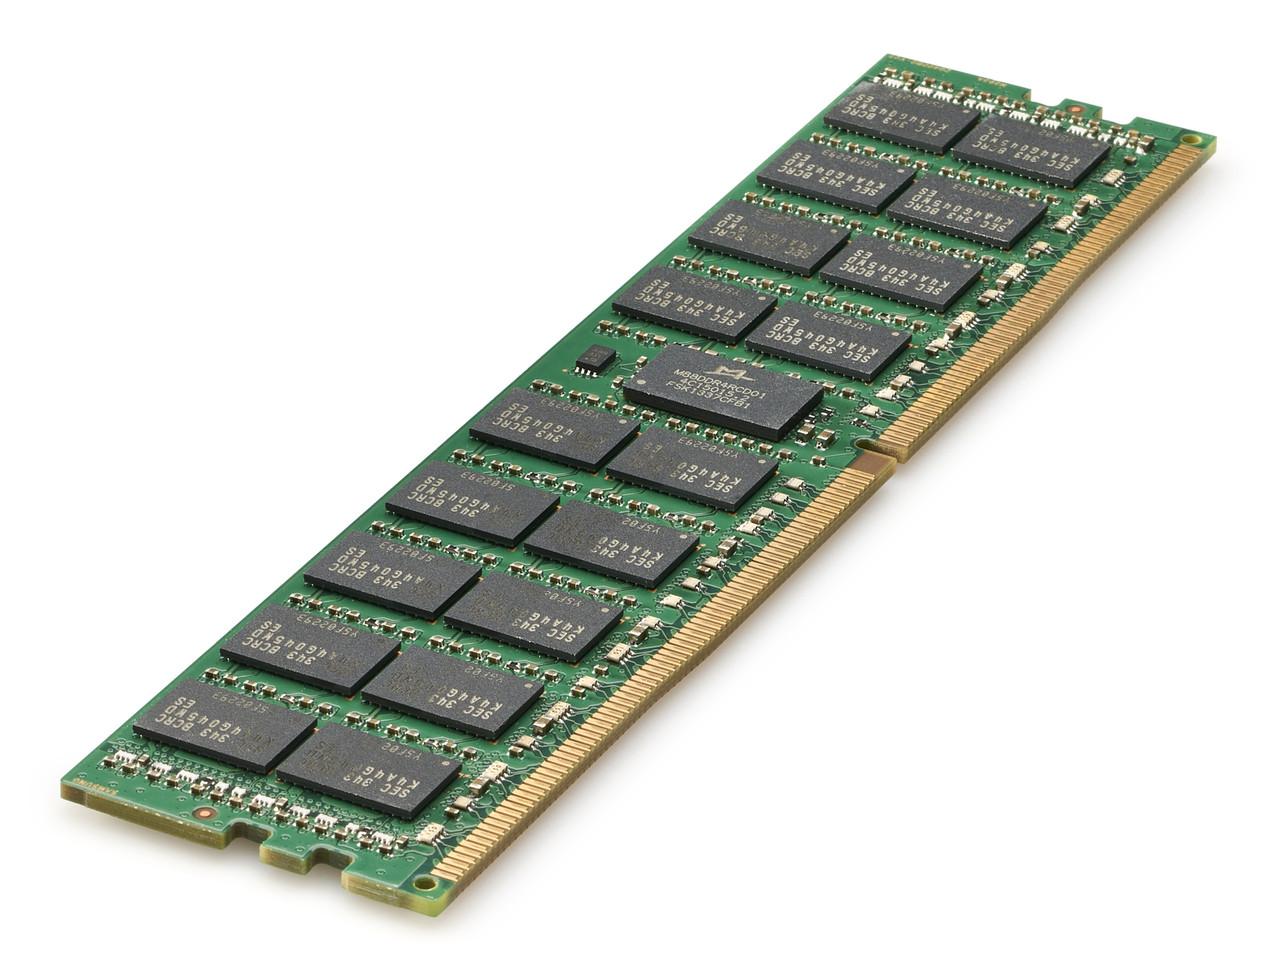 Модуль памяти P00922-B21 HPE 16GB (1x16GB) Dual Rank x8 DDR4-2933 CAS-21-21-21 Registered Smart Memory Kit